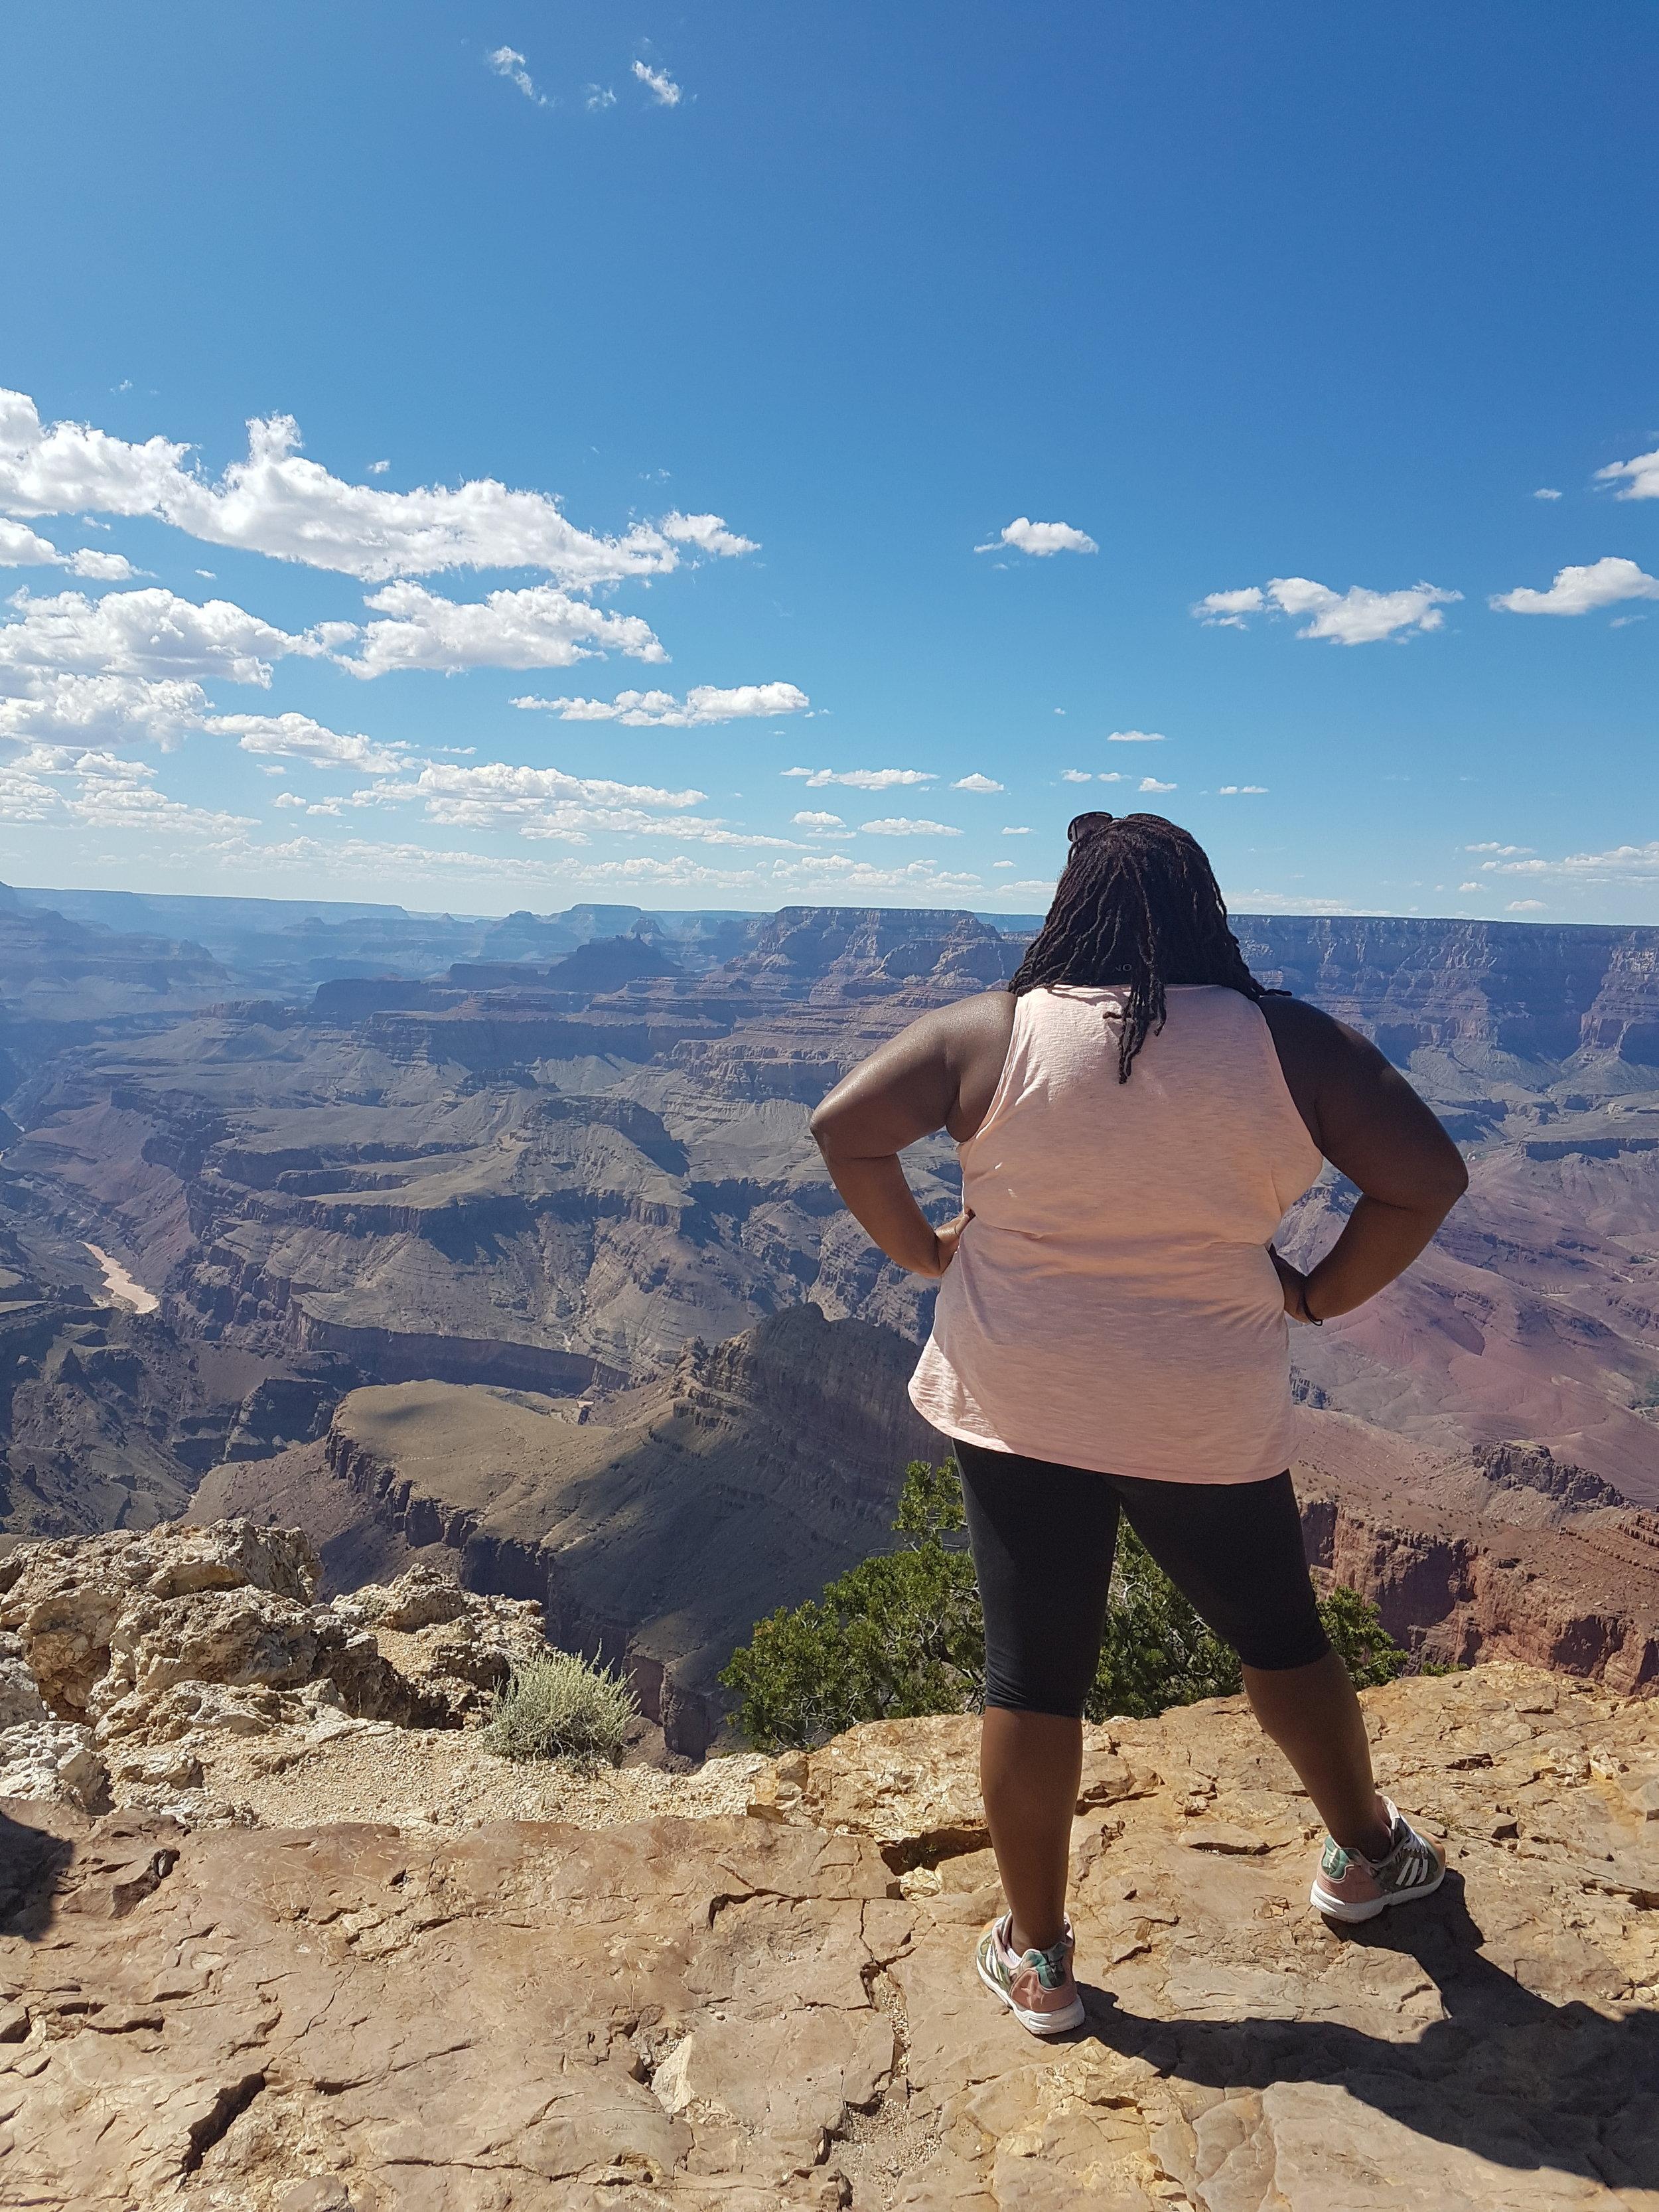 I felt like I was on top of the world @ the Grand Canyon